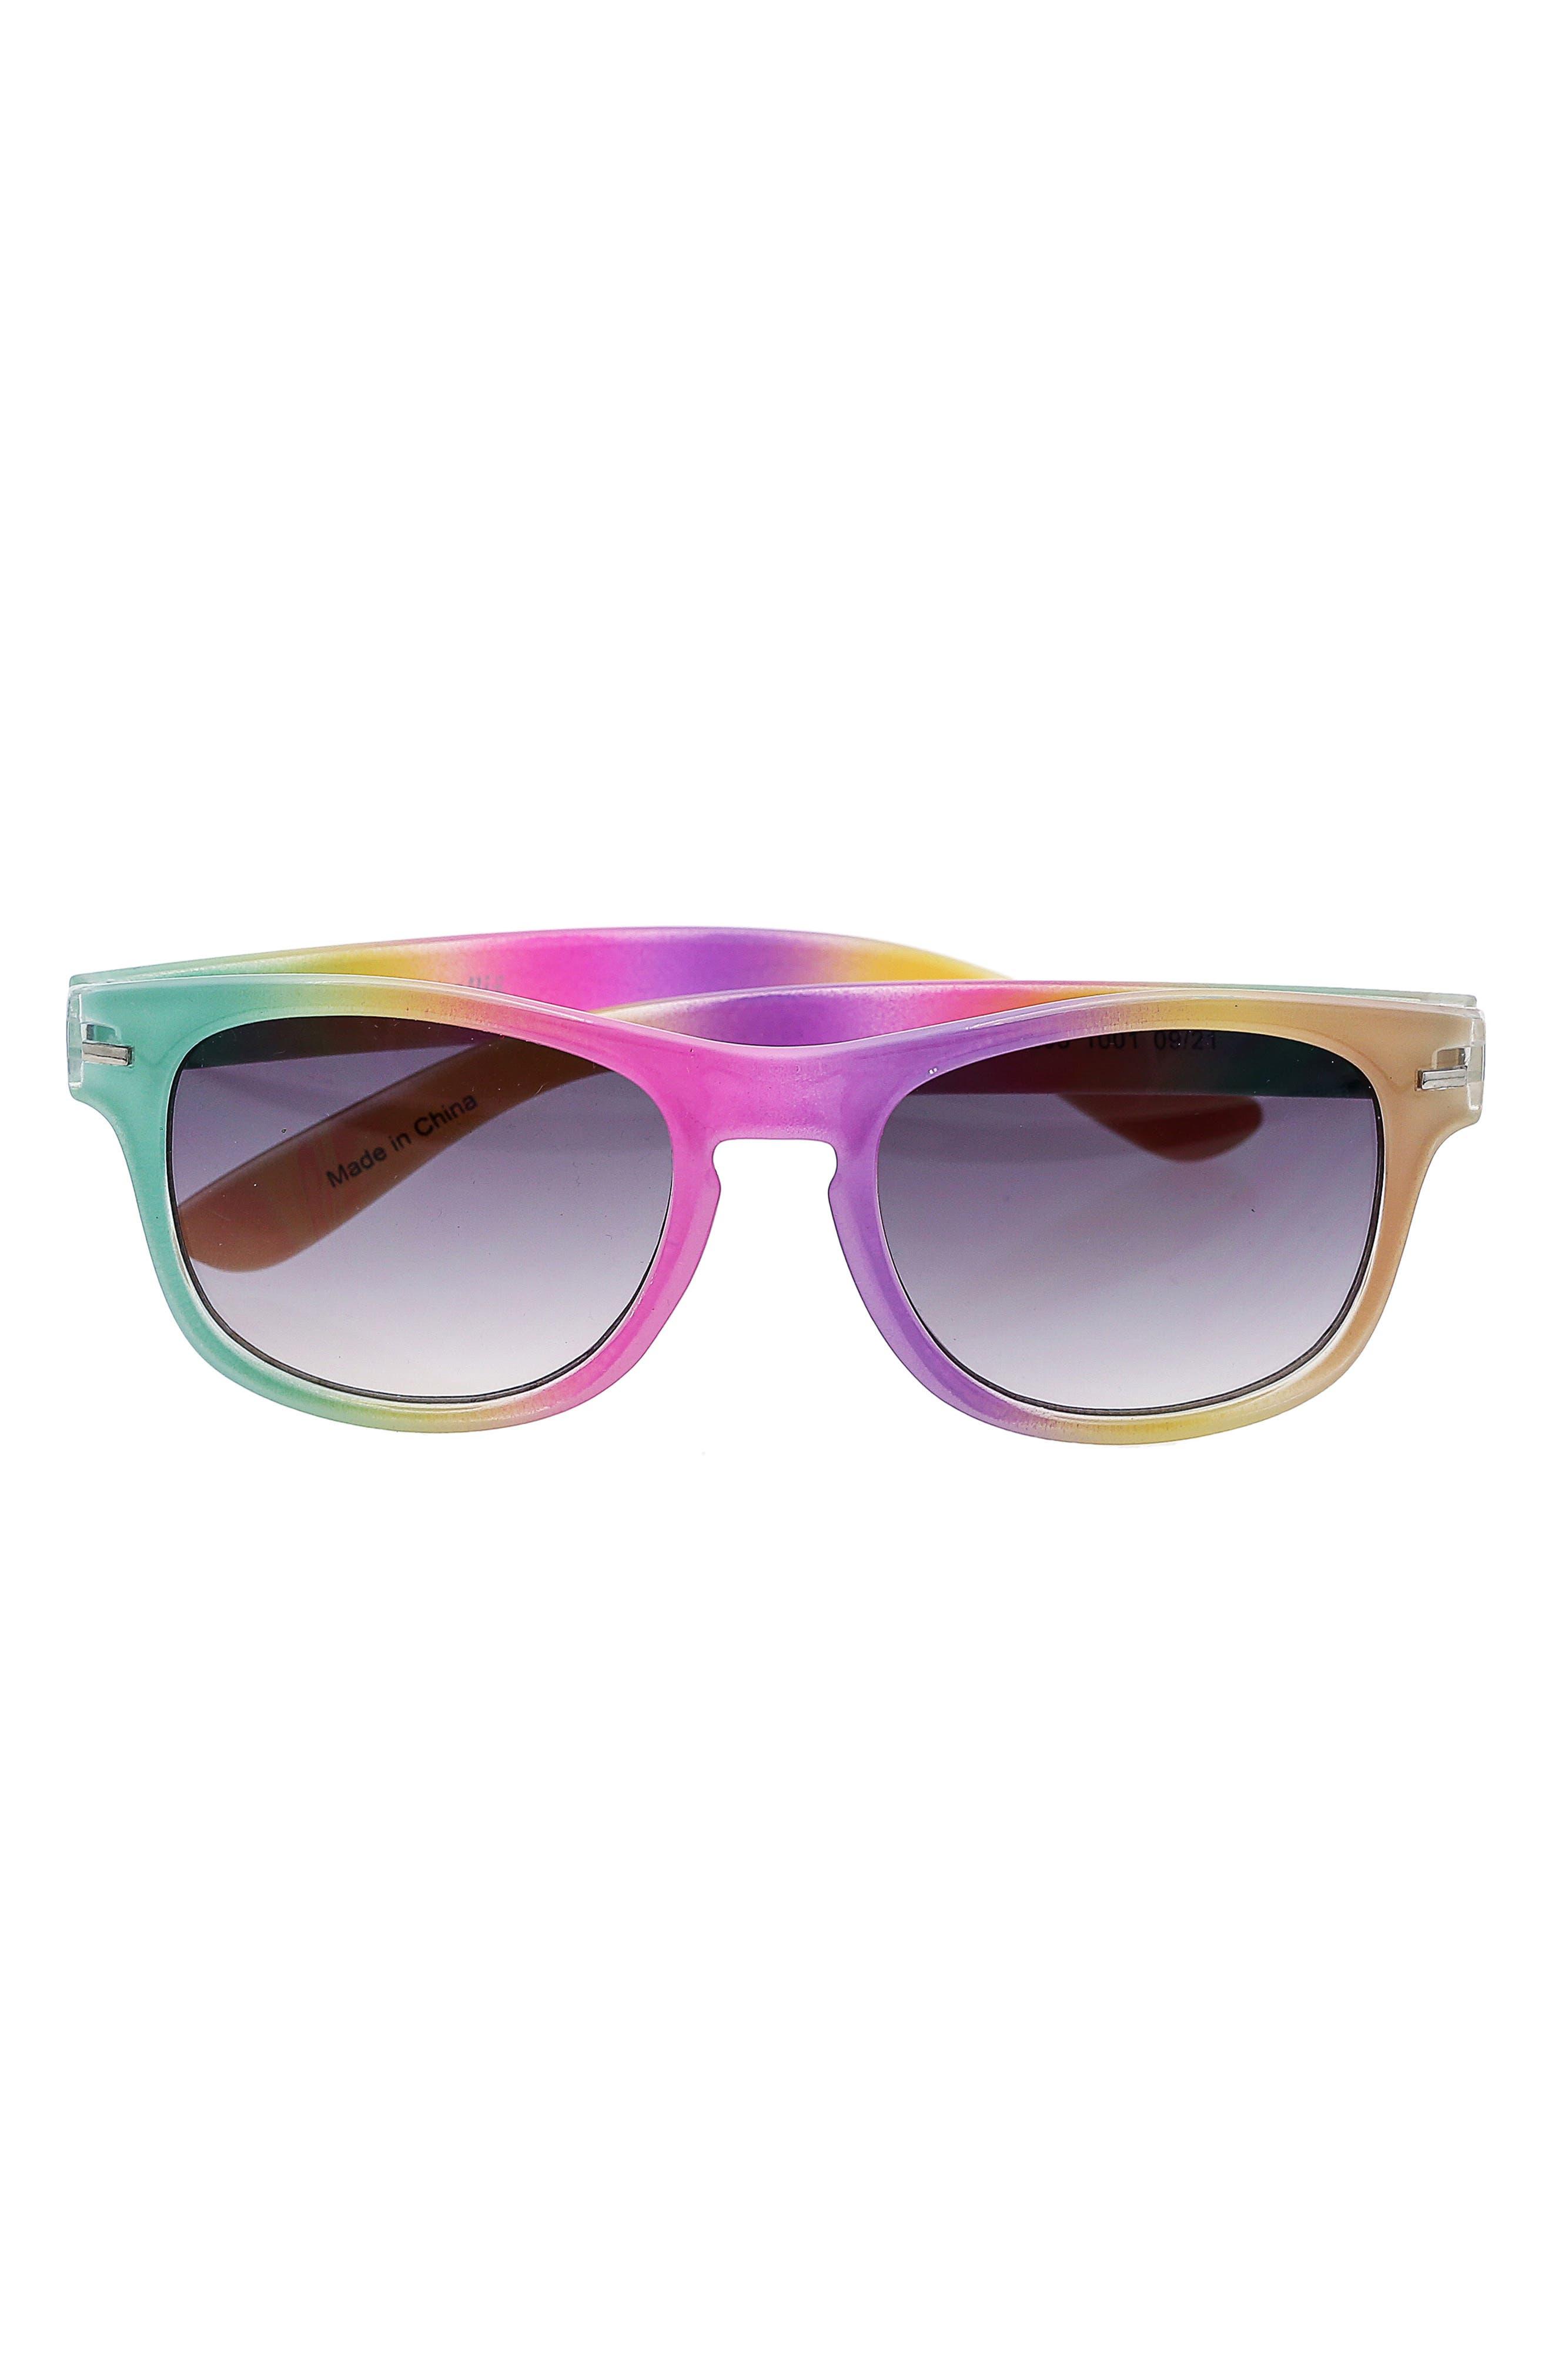 Girls Capelli New York Unicorn Sunglasses  Case Set  Silver Cmb